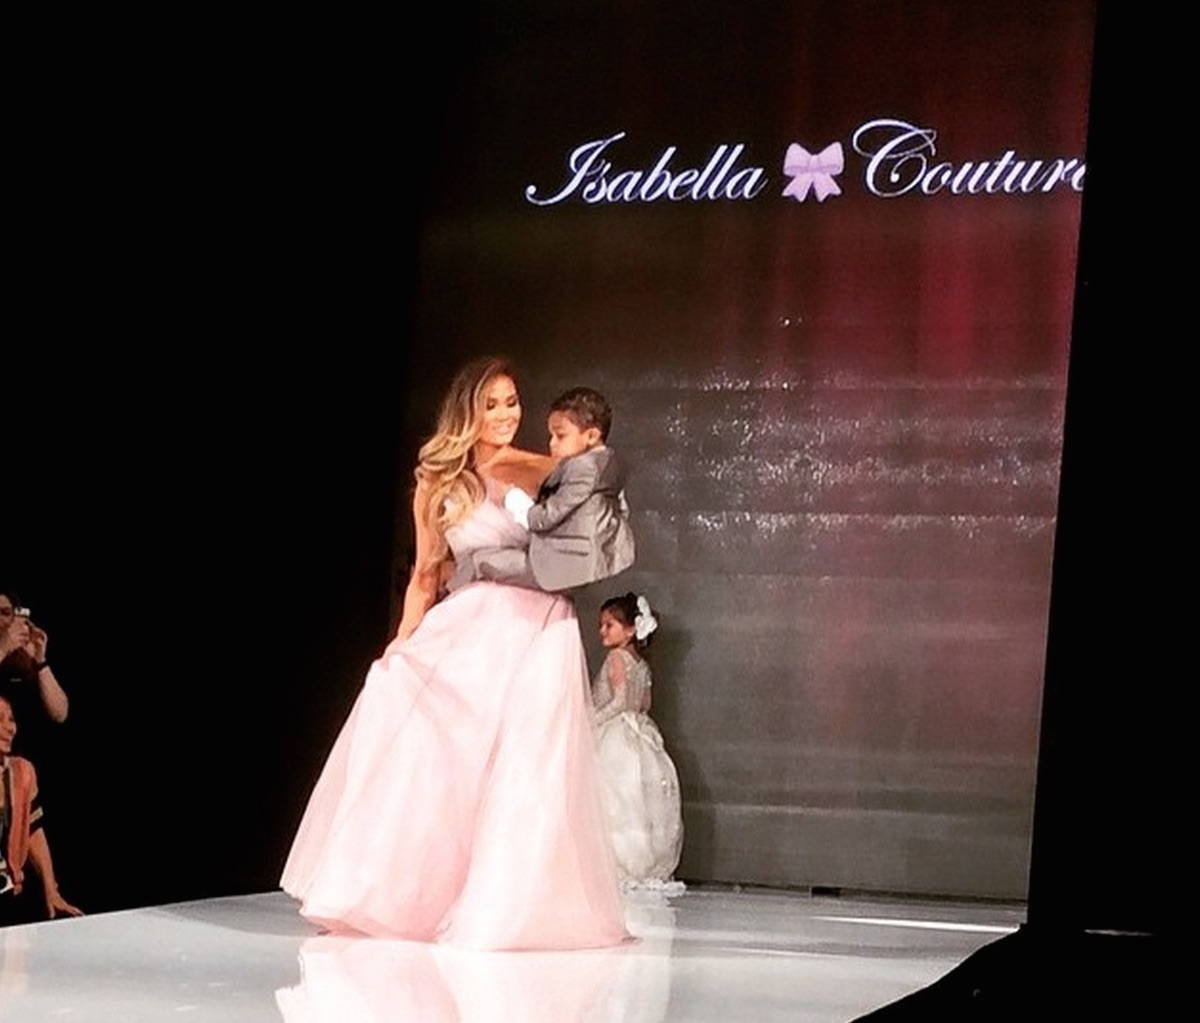 Isabella Couture Children's Designer Clothing Rocks L.A Fashion Week